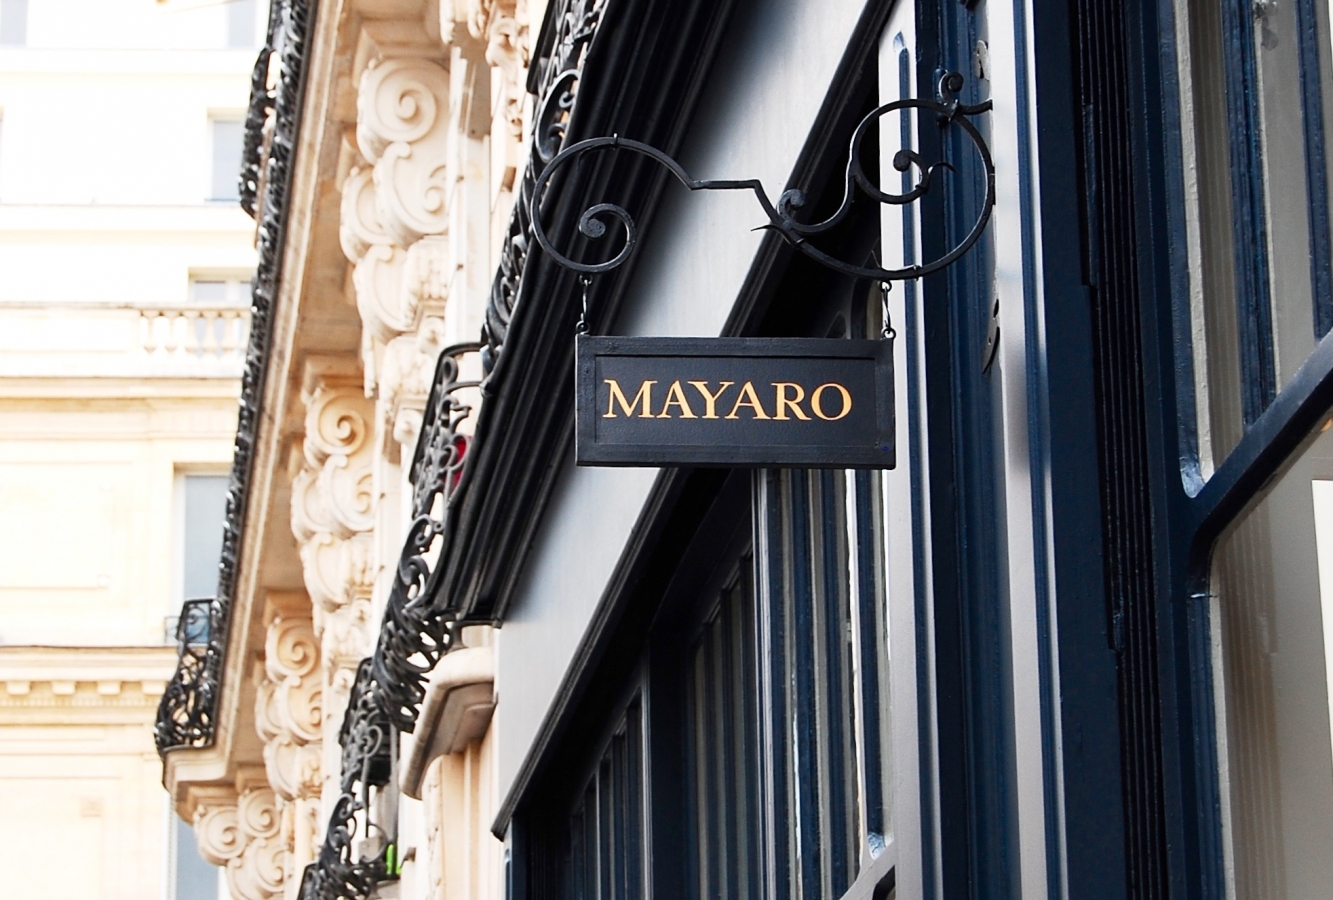 Les vélos de luxe de la Maison Tamboite Paris chez Mayaro